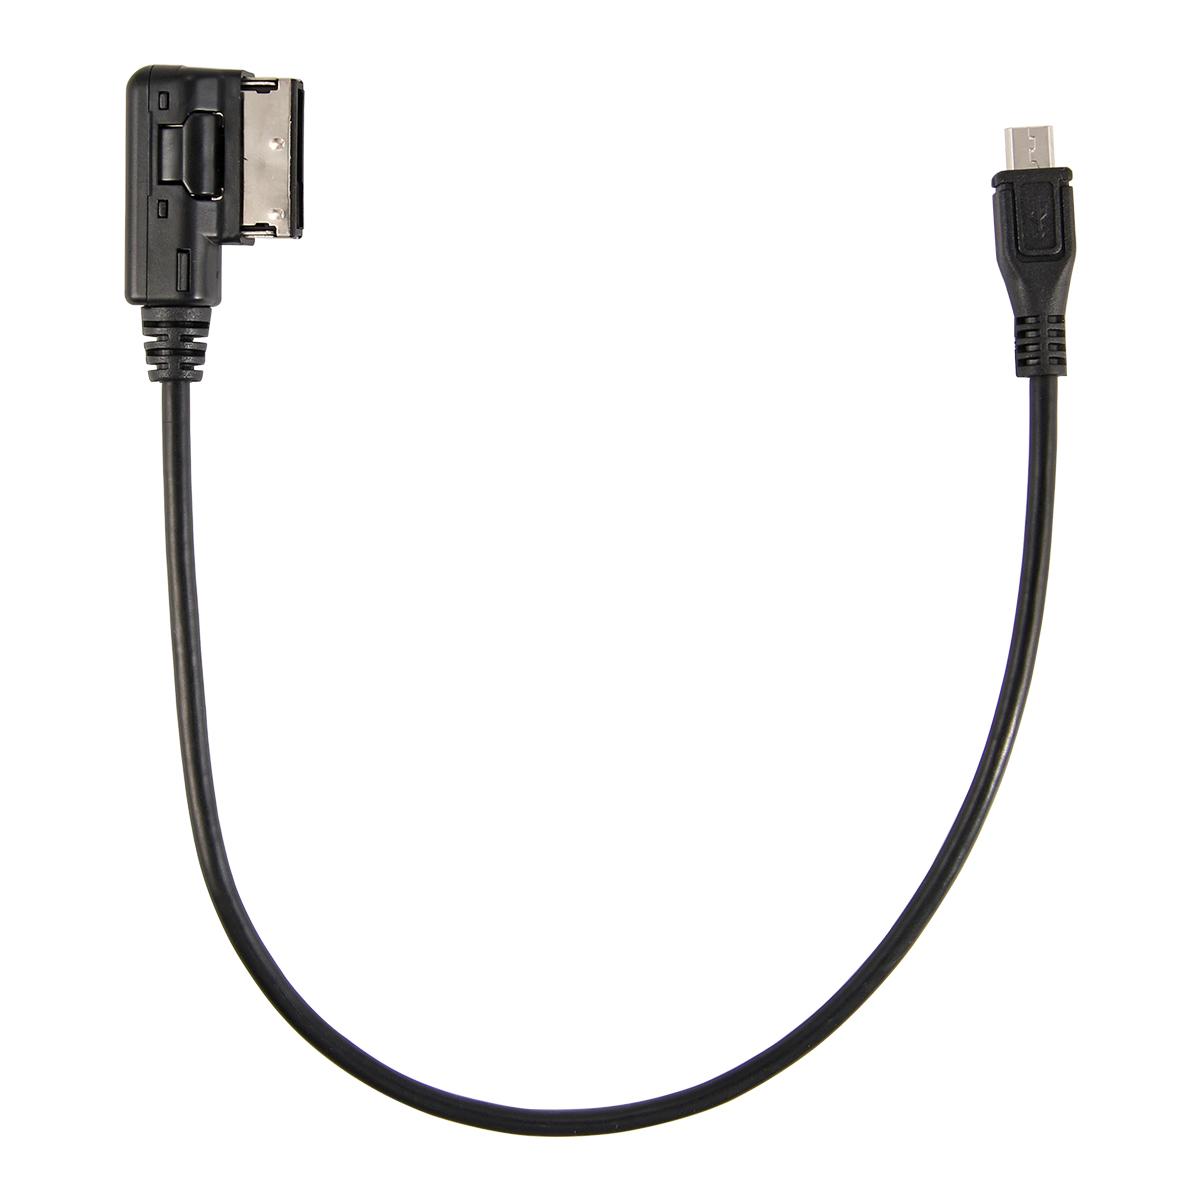 Aliexpress Com Buy Atocoto Ami Mdi Mmi Interface: Audi Ipod Cable Ã�ロモーション- Aliexpress.comでのプロモーションショッピングAudi